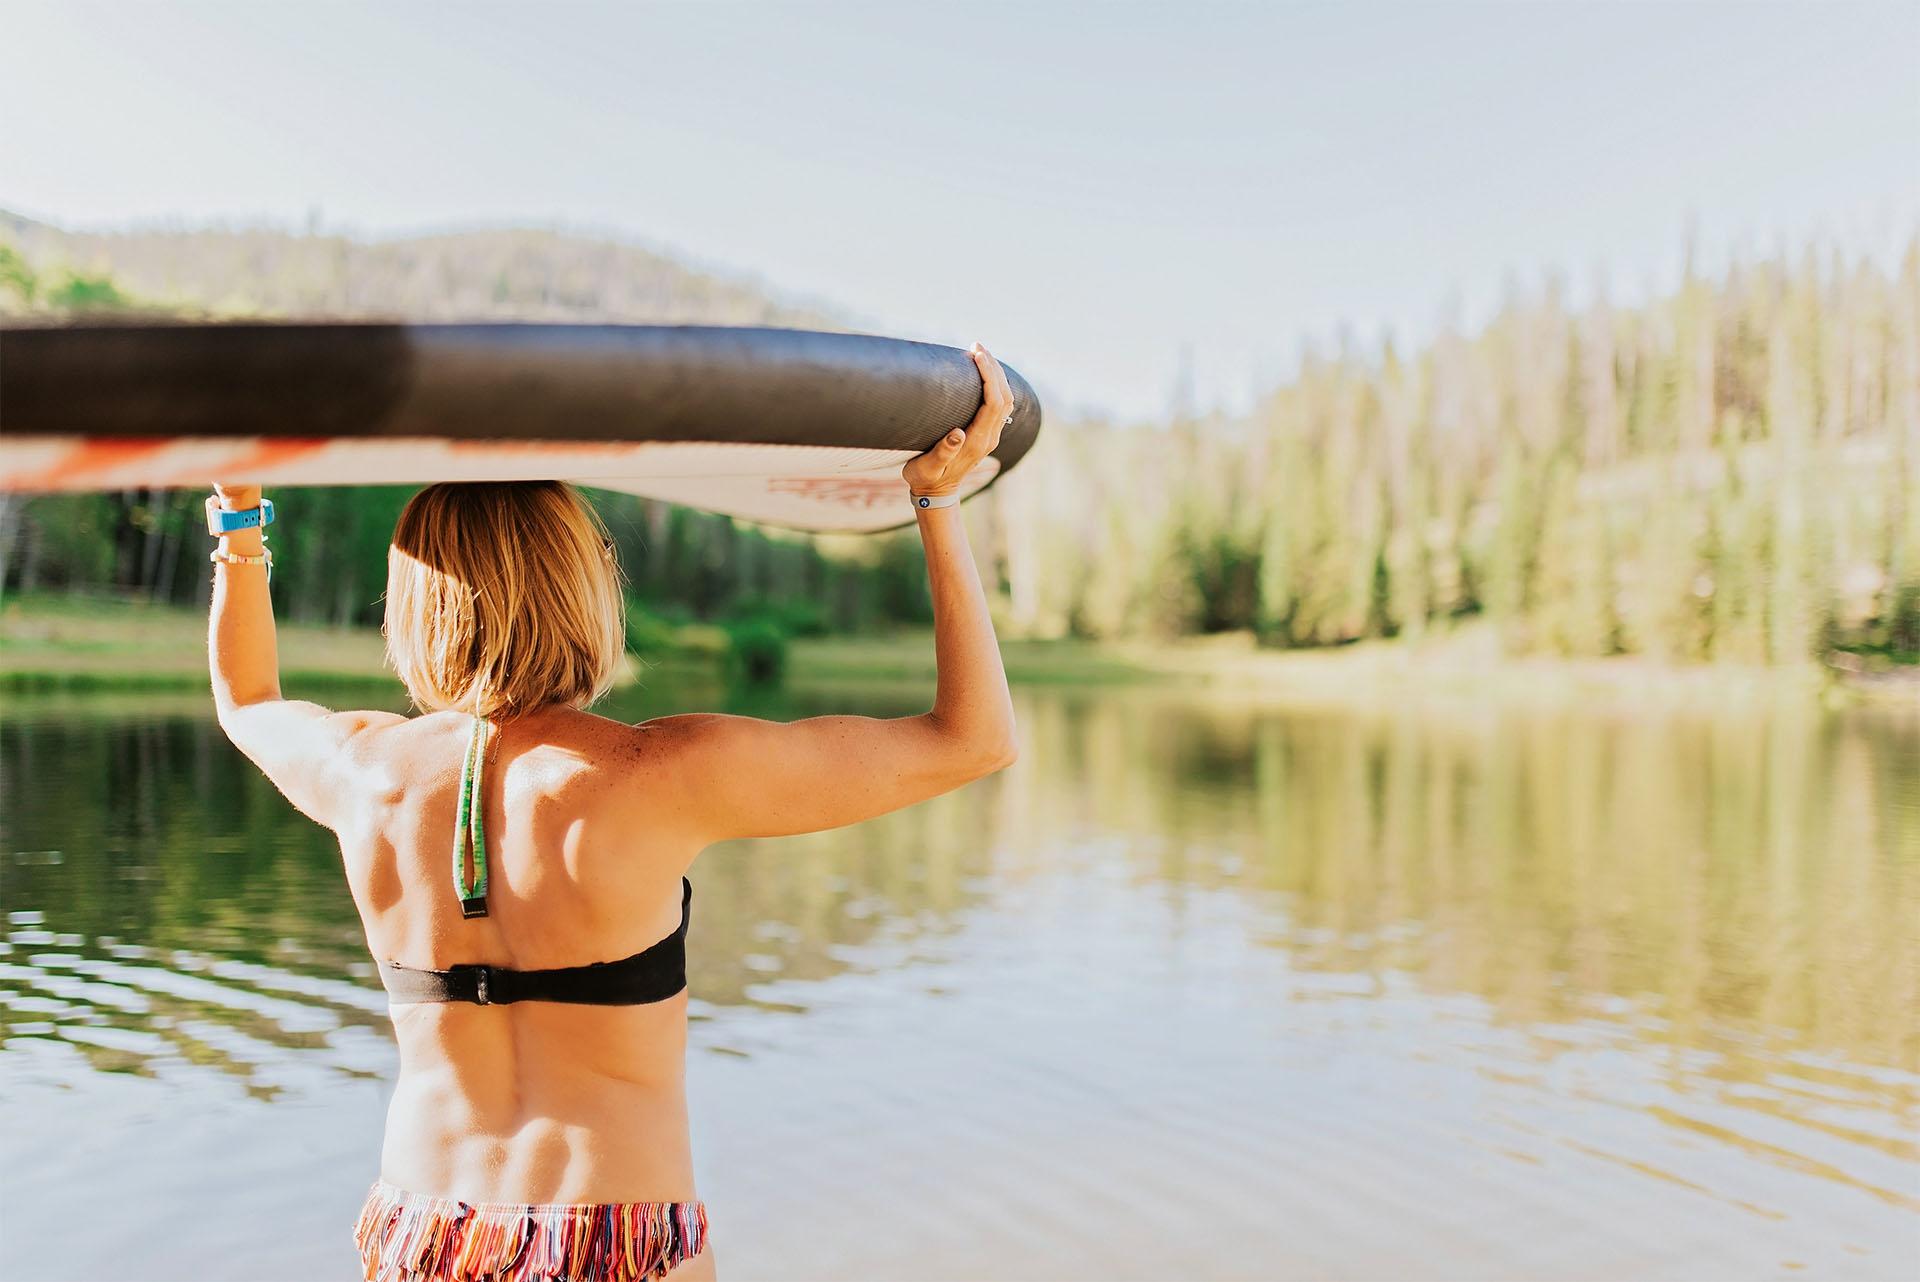 Woman balancing a paddleboard on her head near a mountain lake